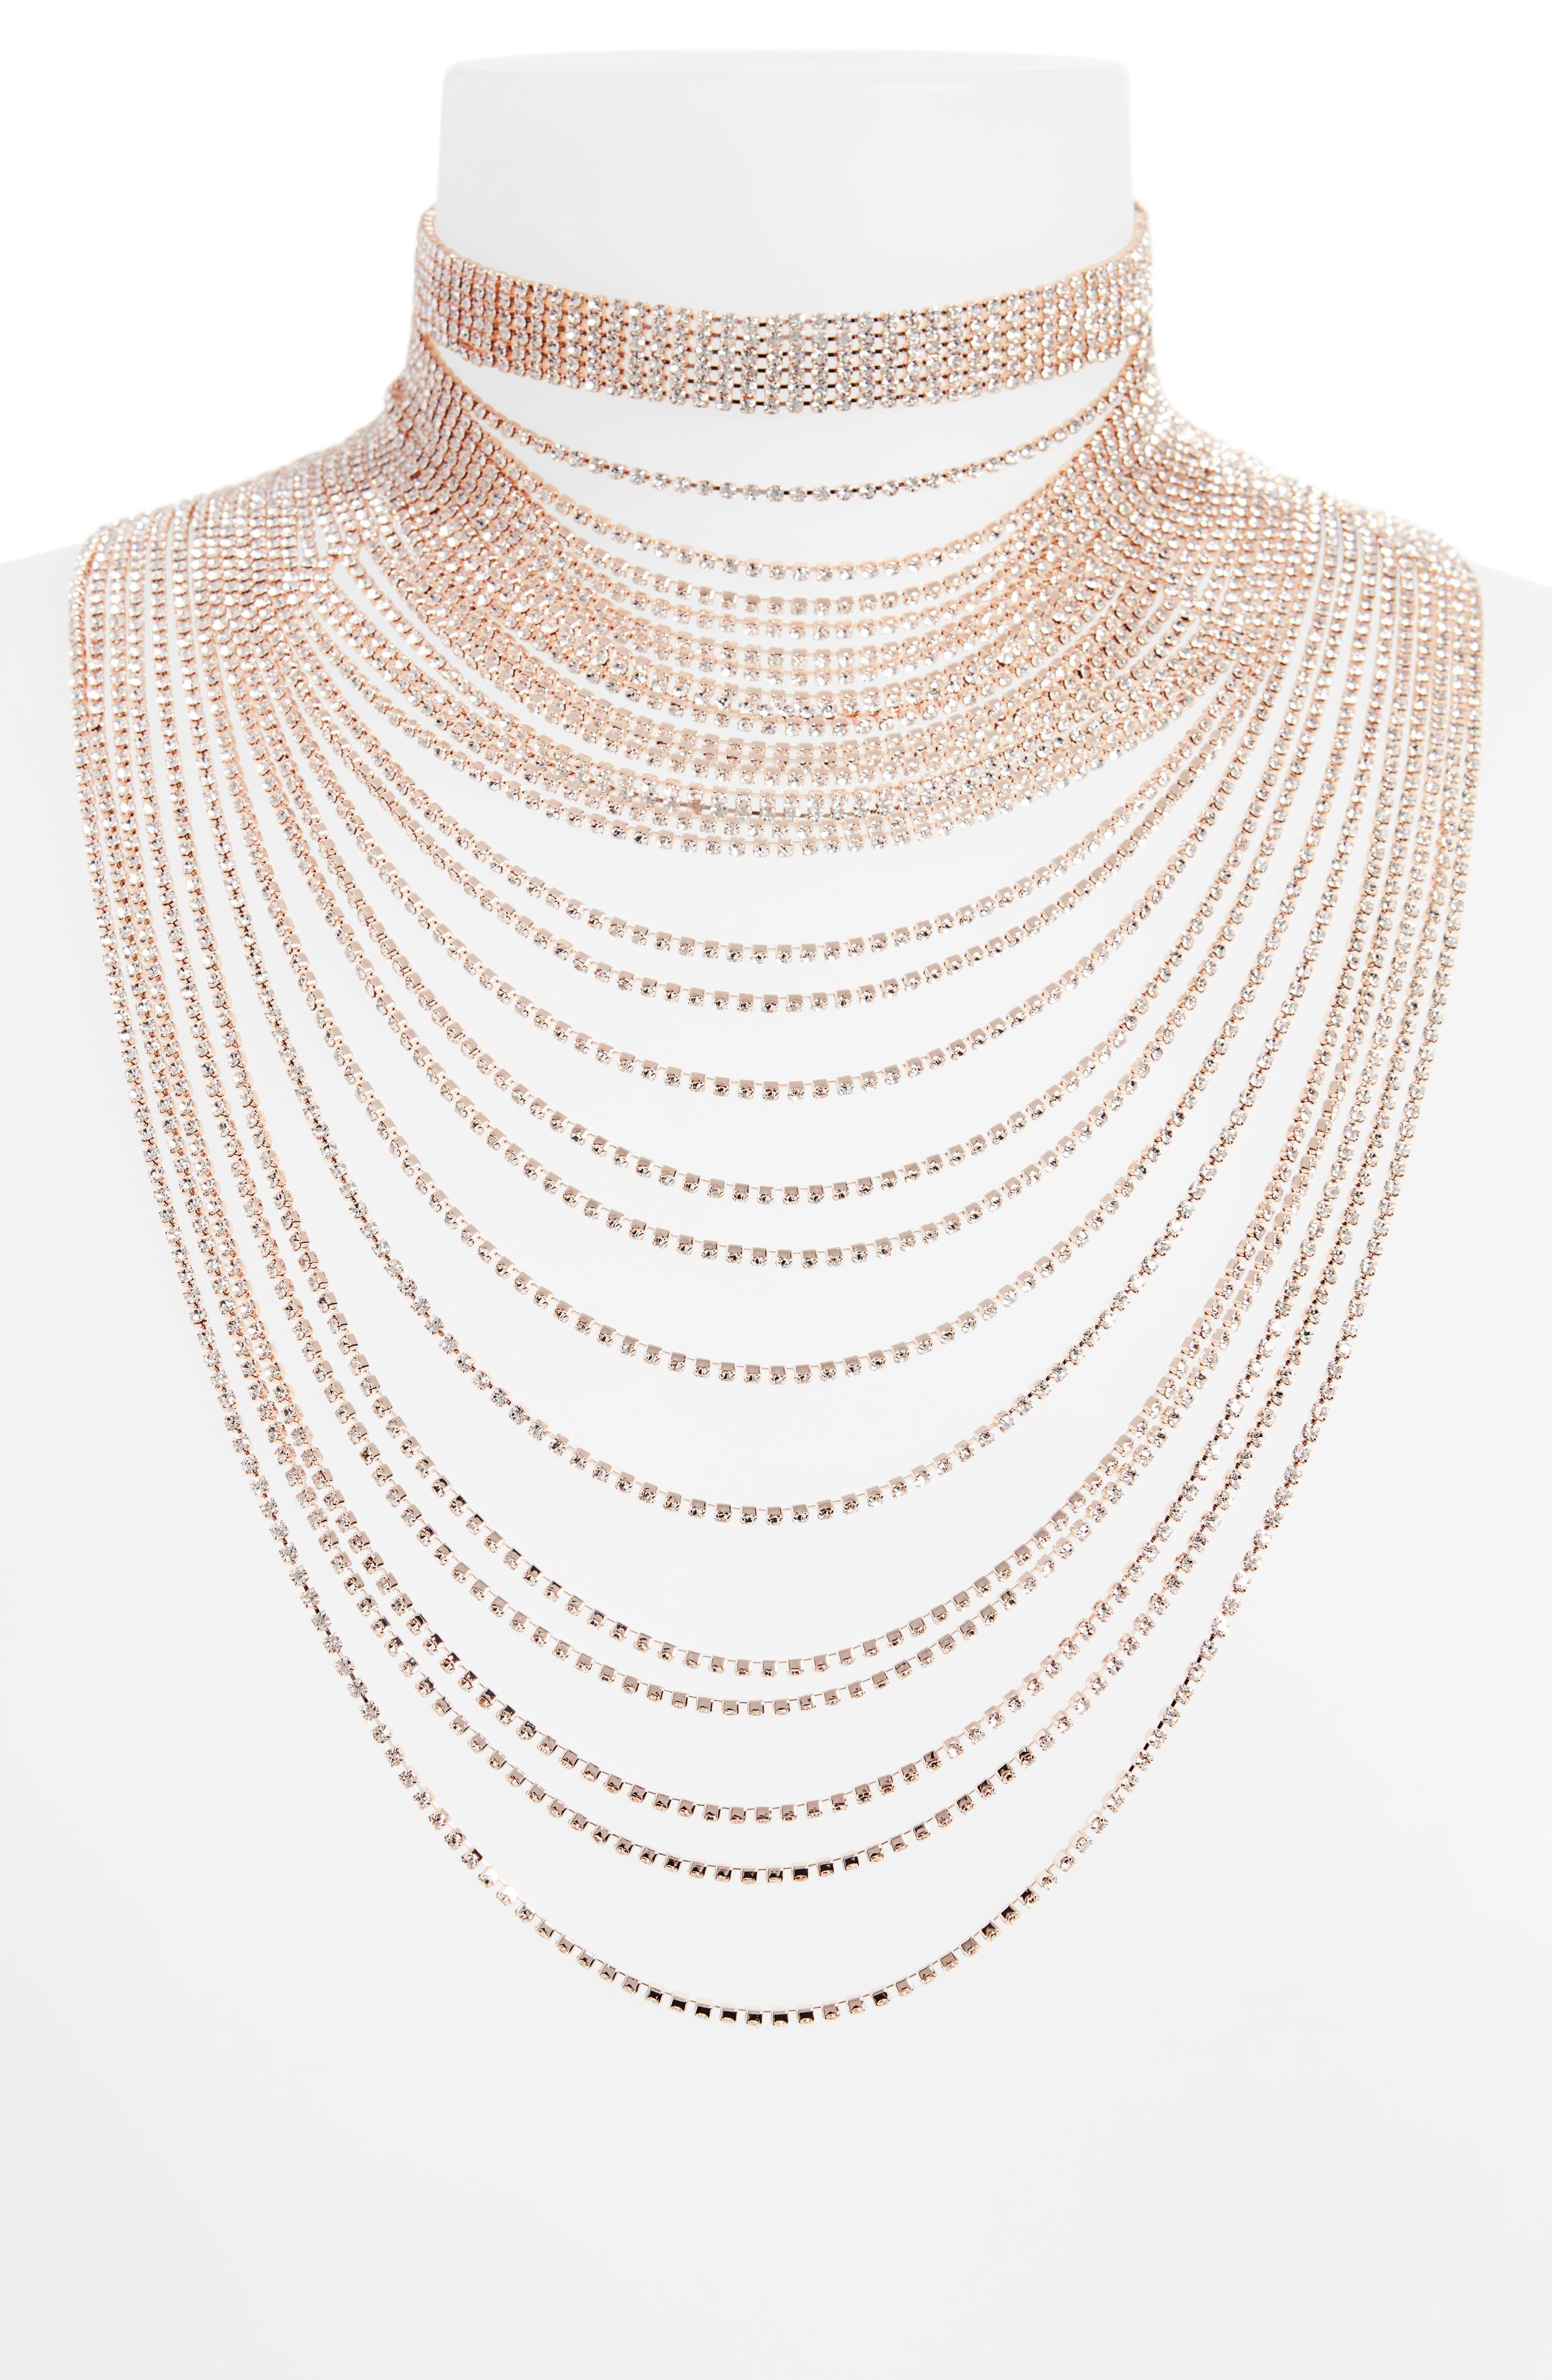 Natasha Layered Crystal Choker Necklace